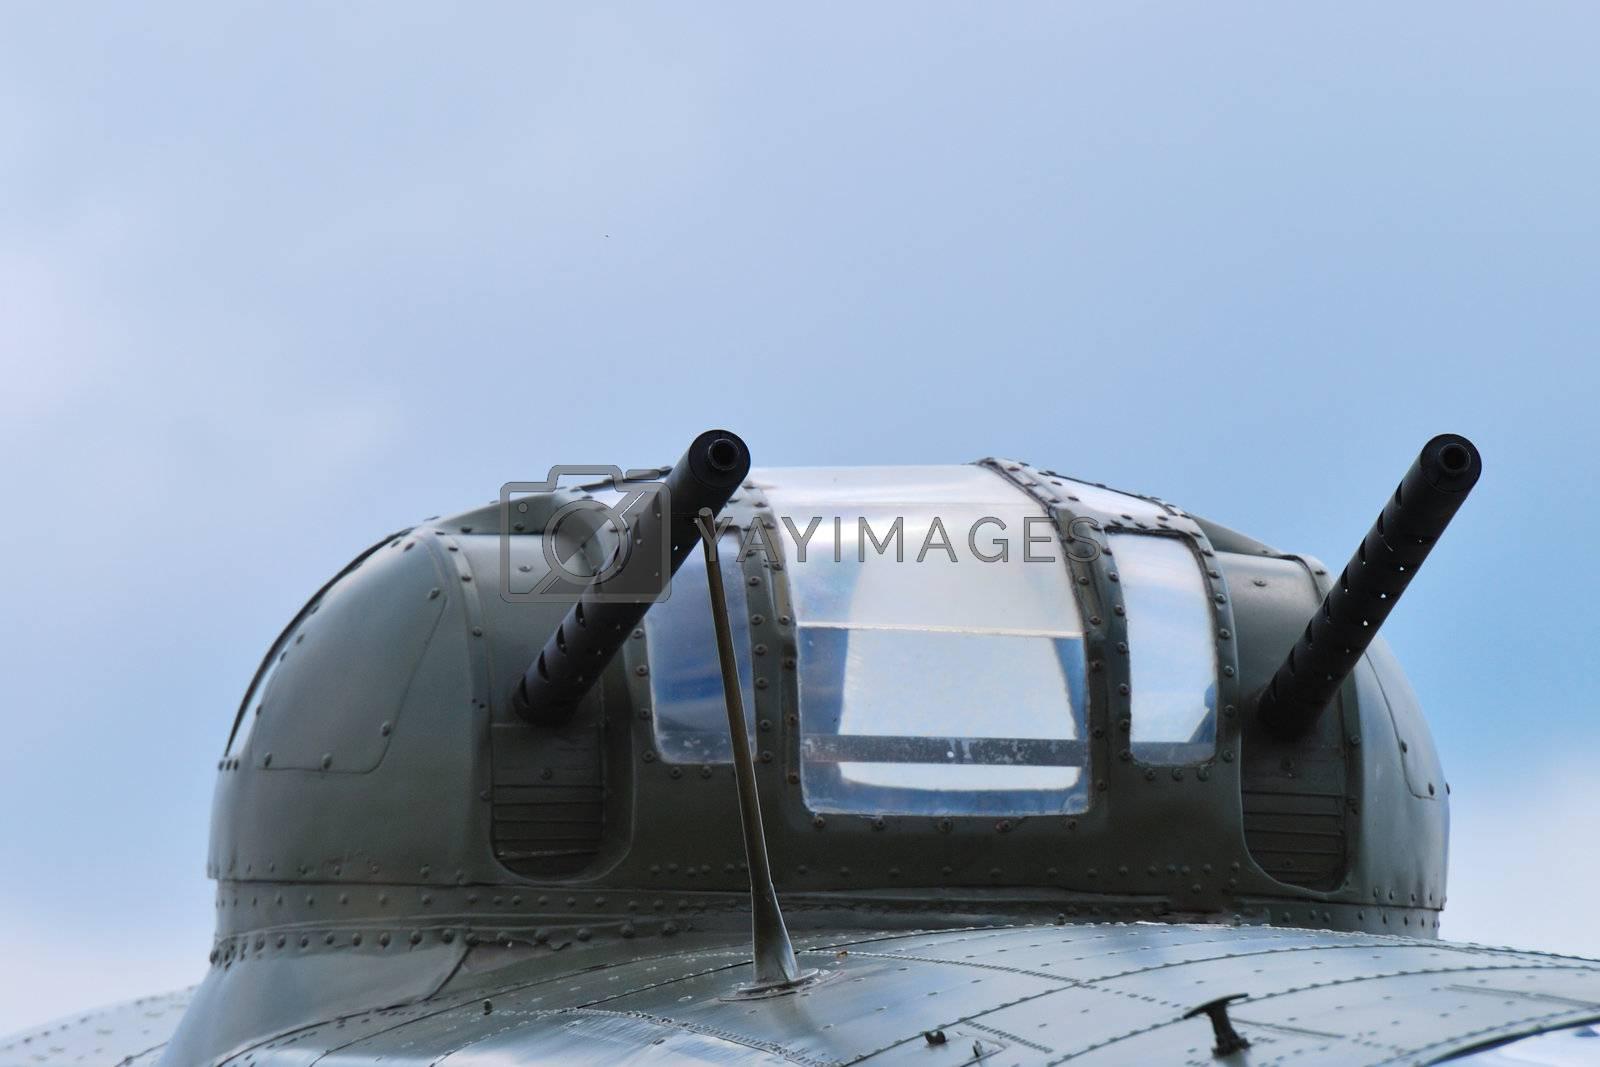 Aircraft turret with machine guns